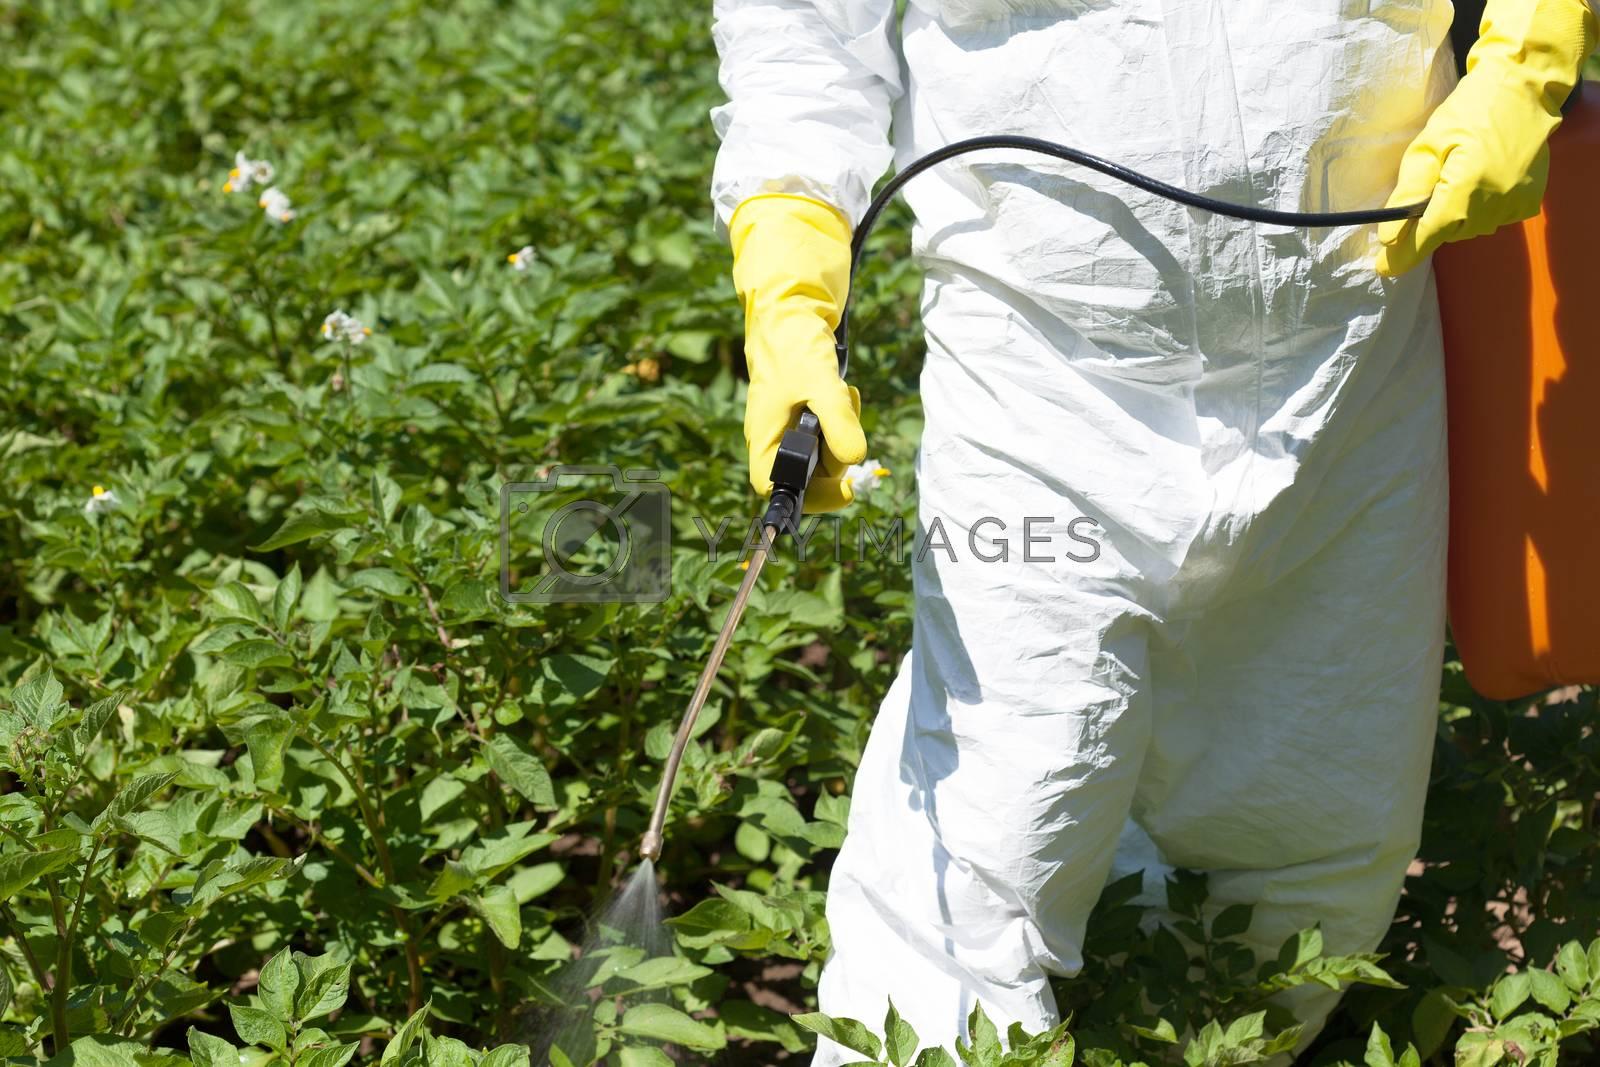 Farmer spraying toxic pesticides in the vegetable garden. Non-organic food.